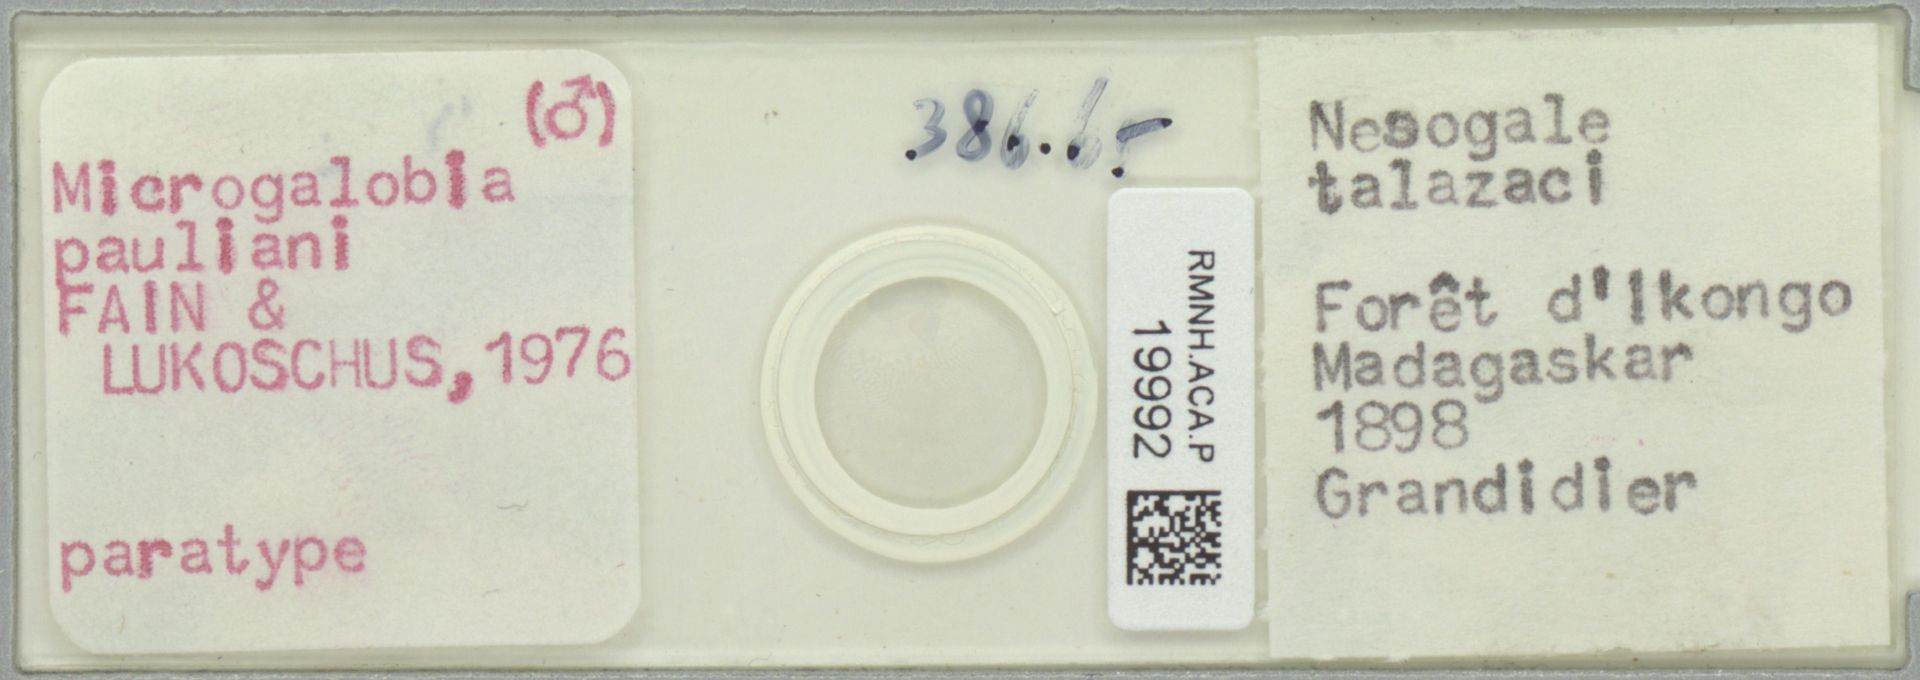 RMNH.ACA.P.19992   Microgalobia pauliani Fain & Lukoschus 1976